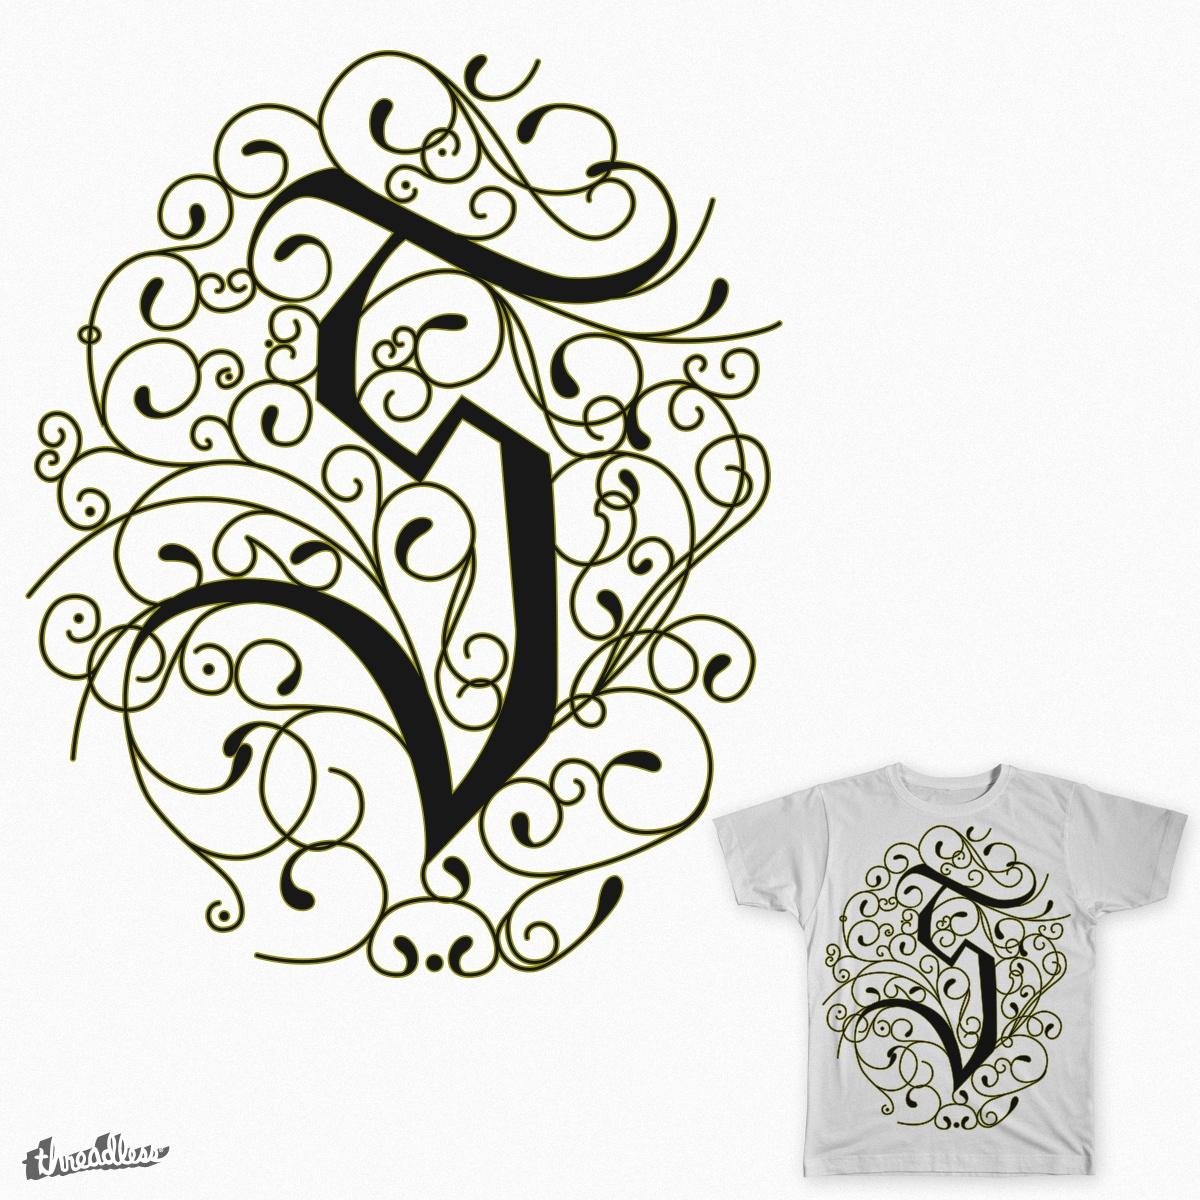 Ornamental S by silverio.contreras.7 on Threadless